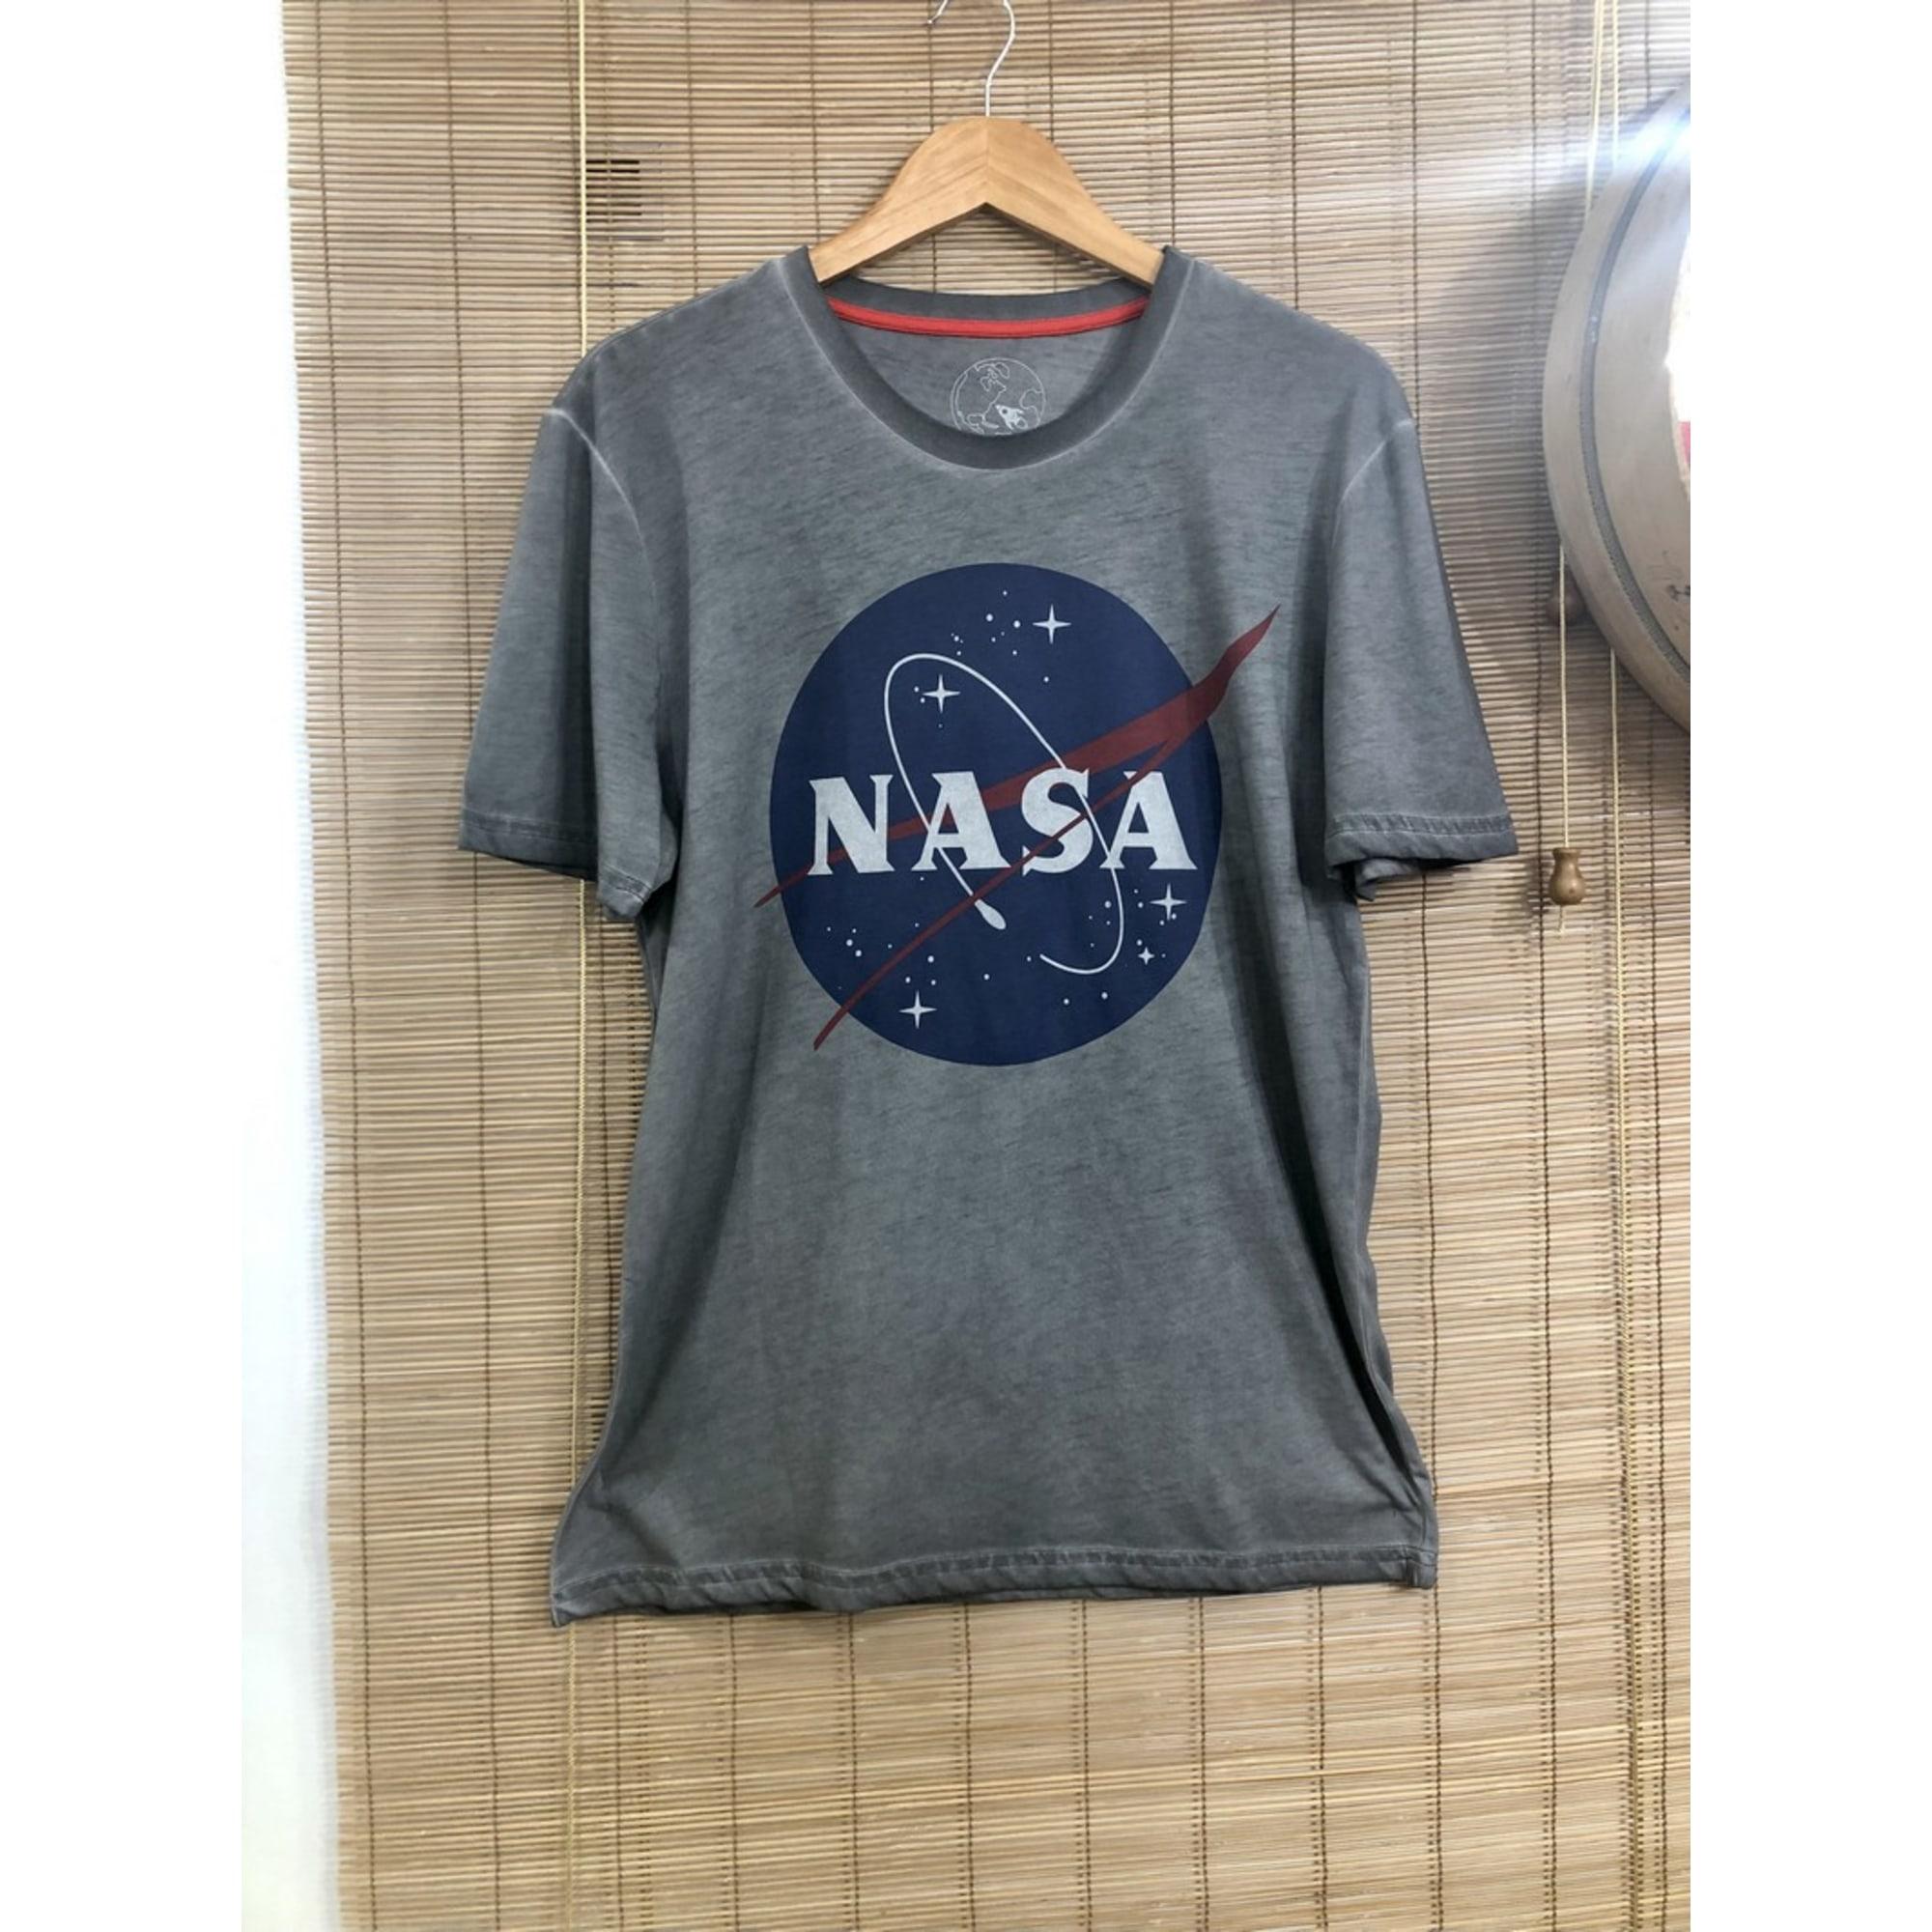 Tee-shirt NASA Gris, anthracite